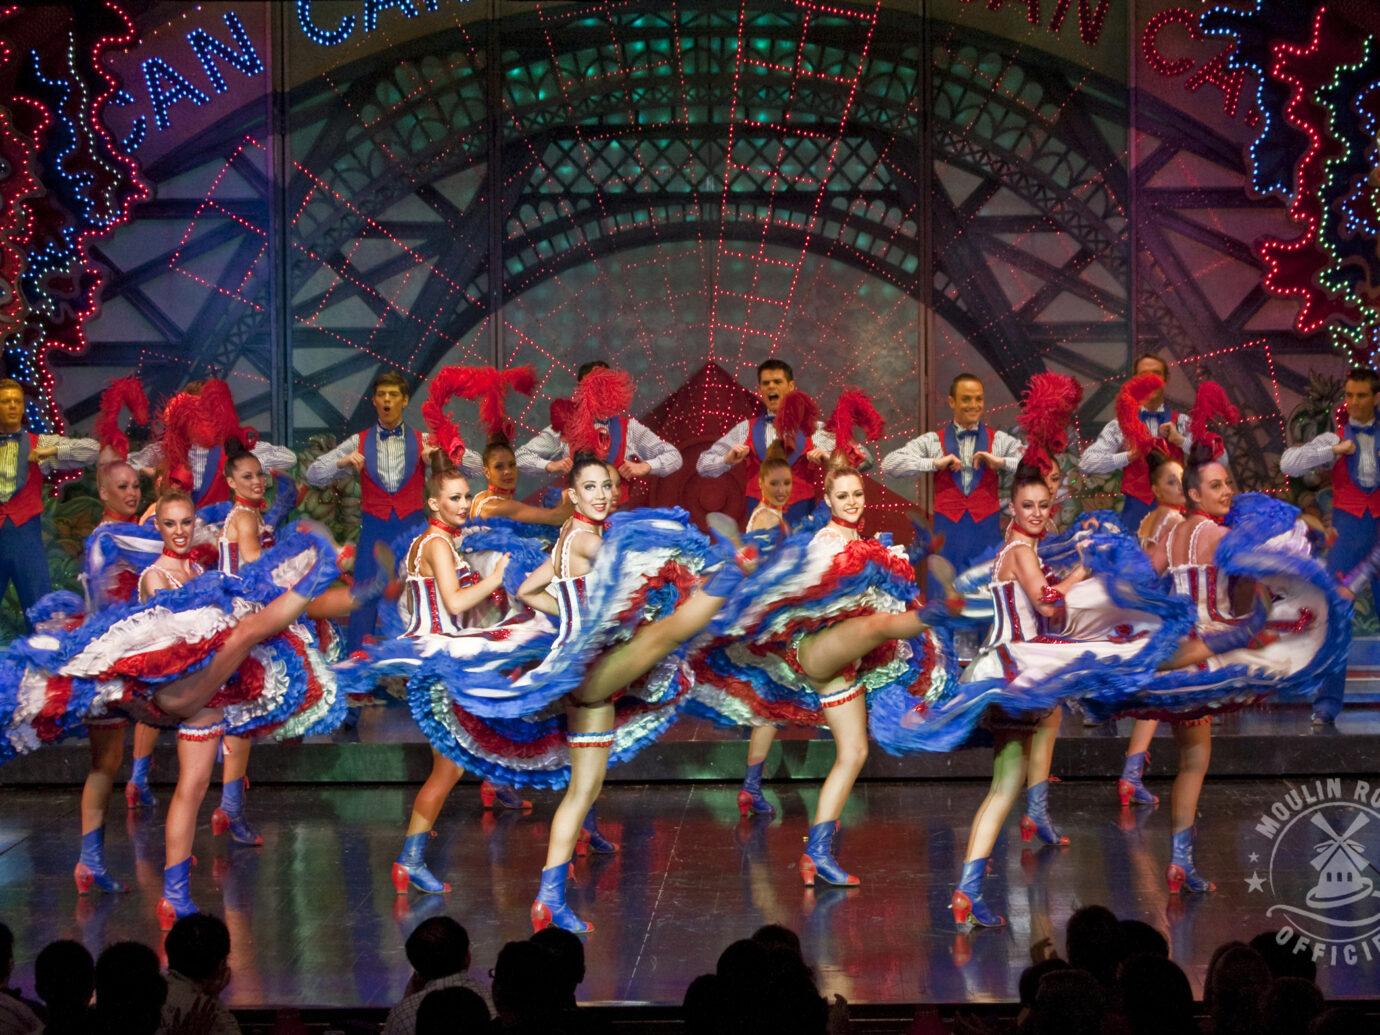 dancers at Moulin Rouge